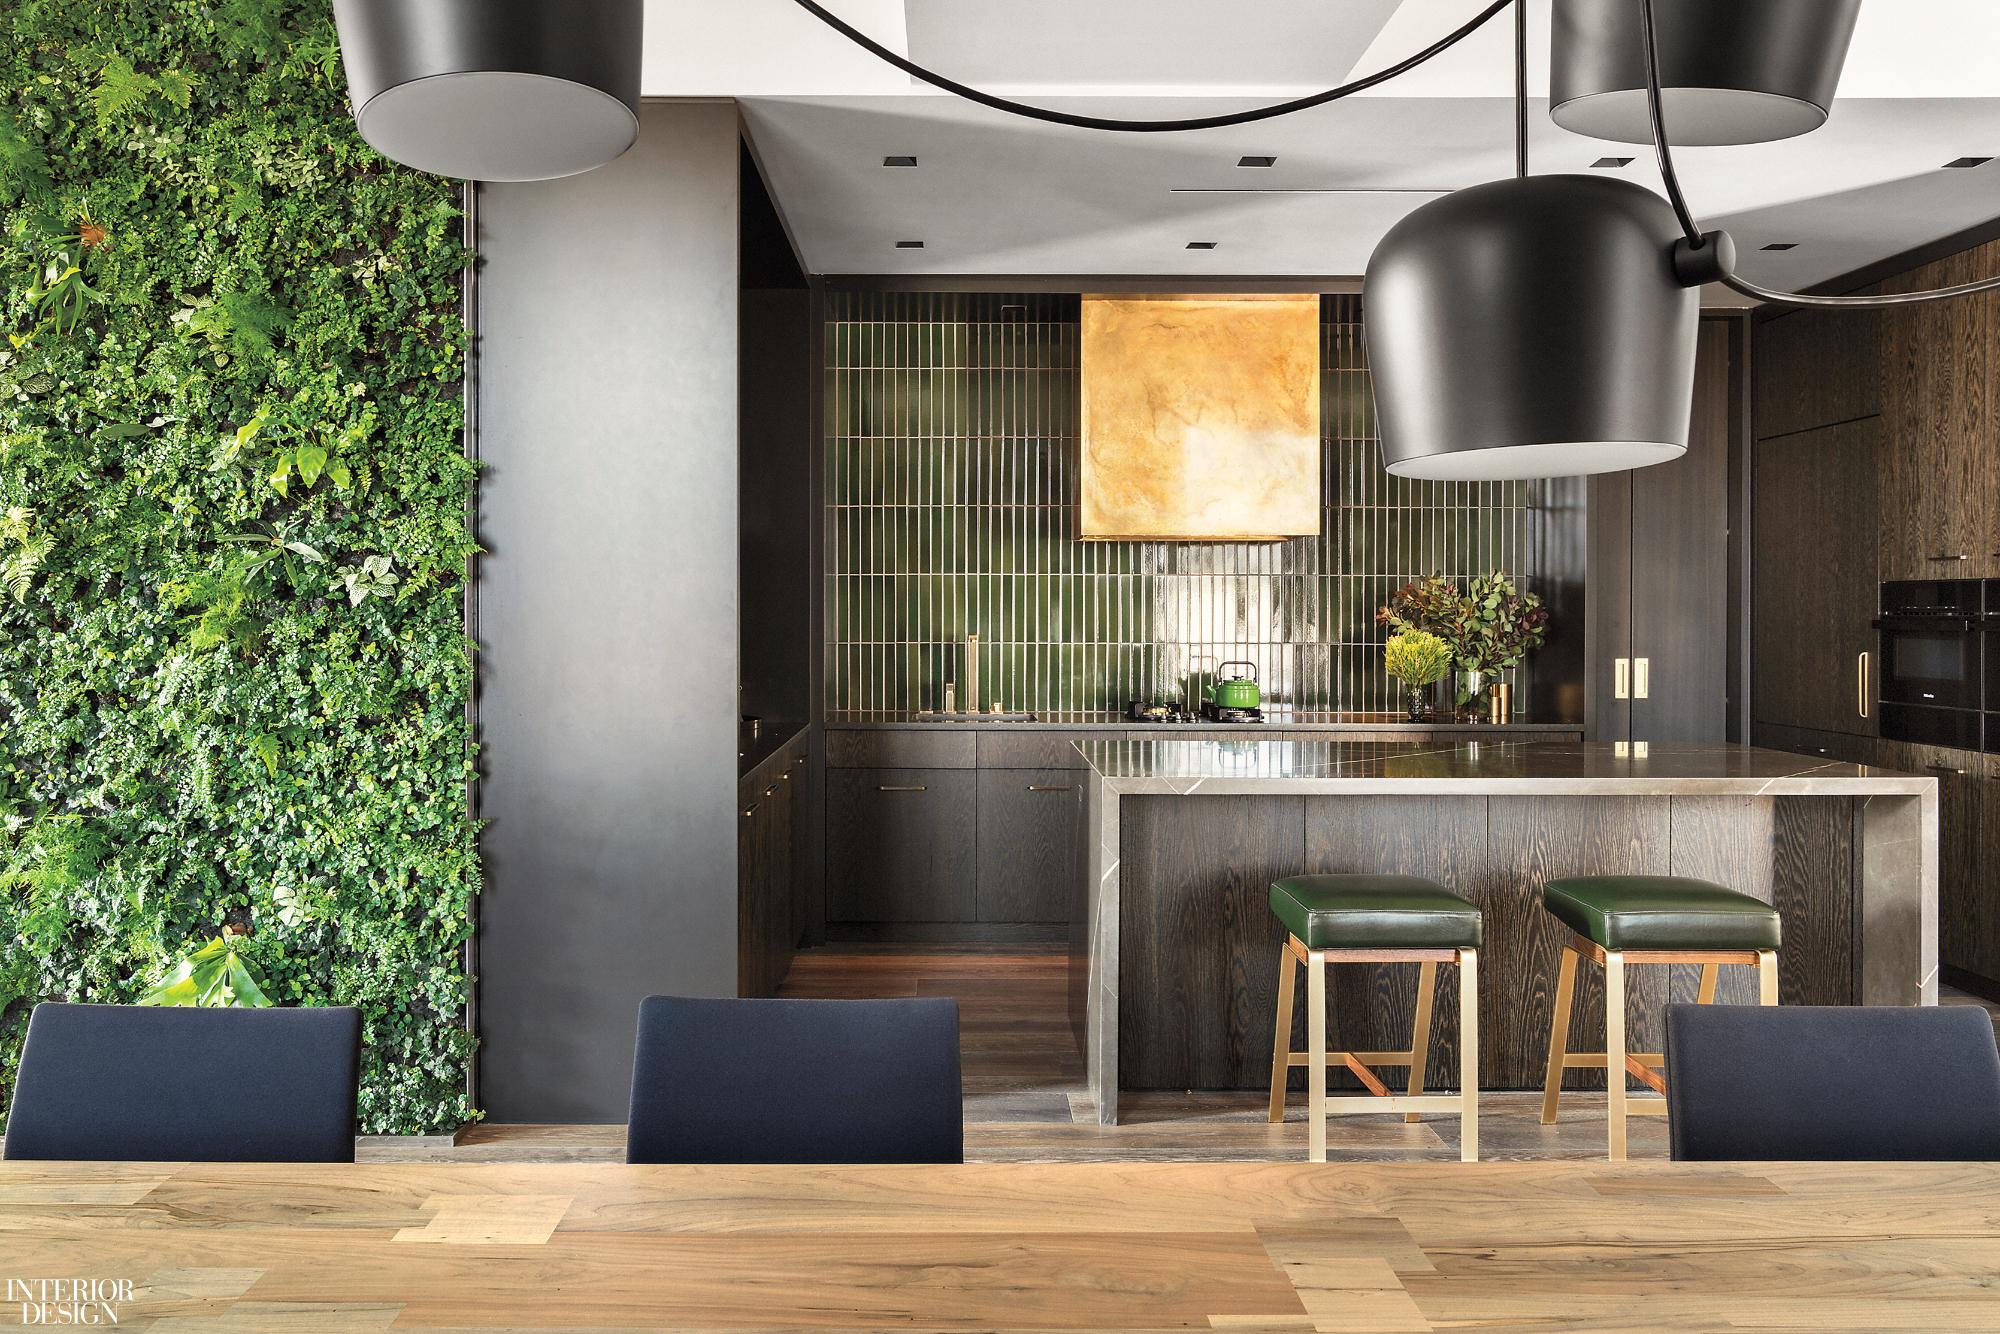 Swell Shamir Shah Masterminds A Manhattan Loft For Repeat Clients Home Interior And Landscaping Eliaenasavecom